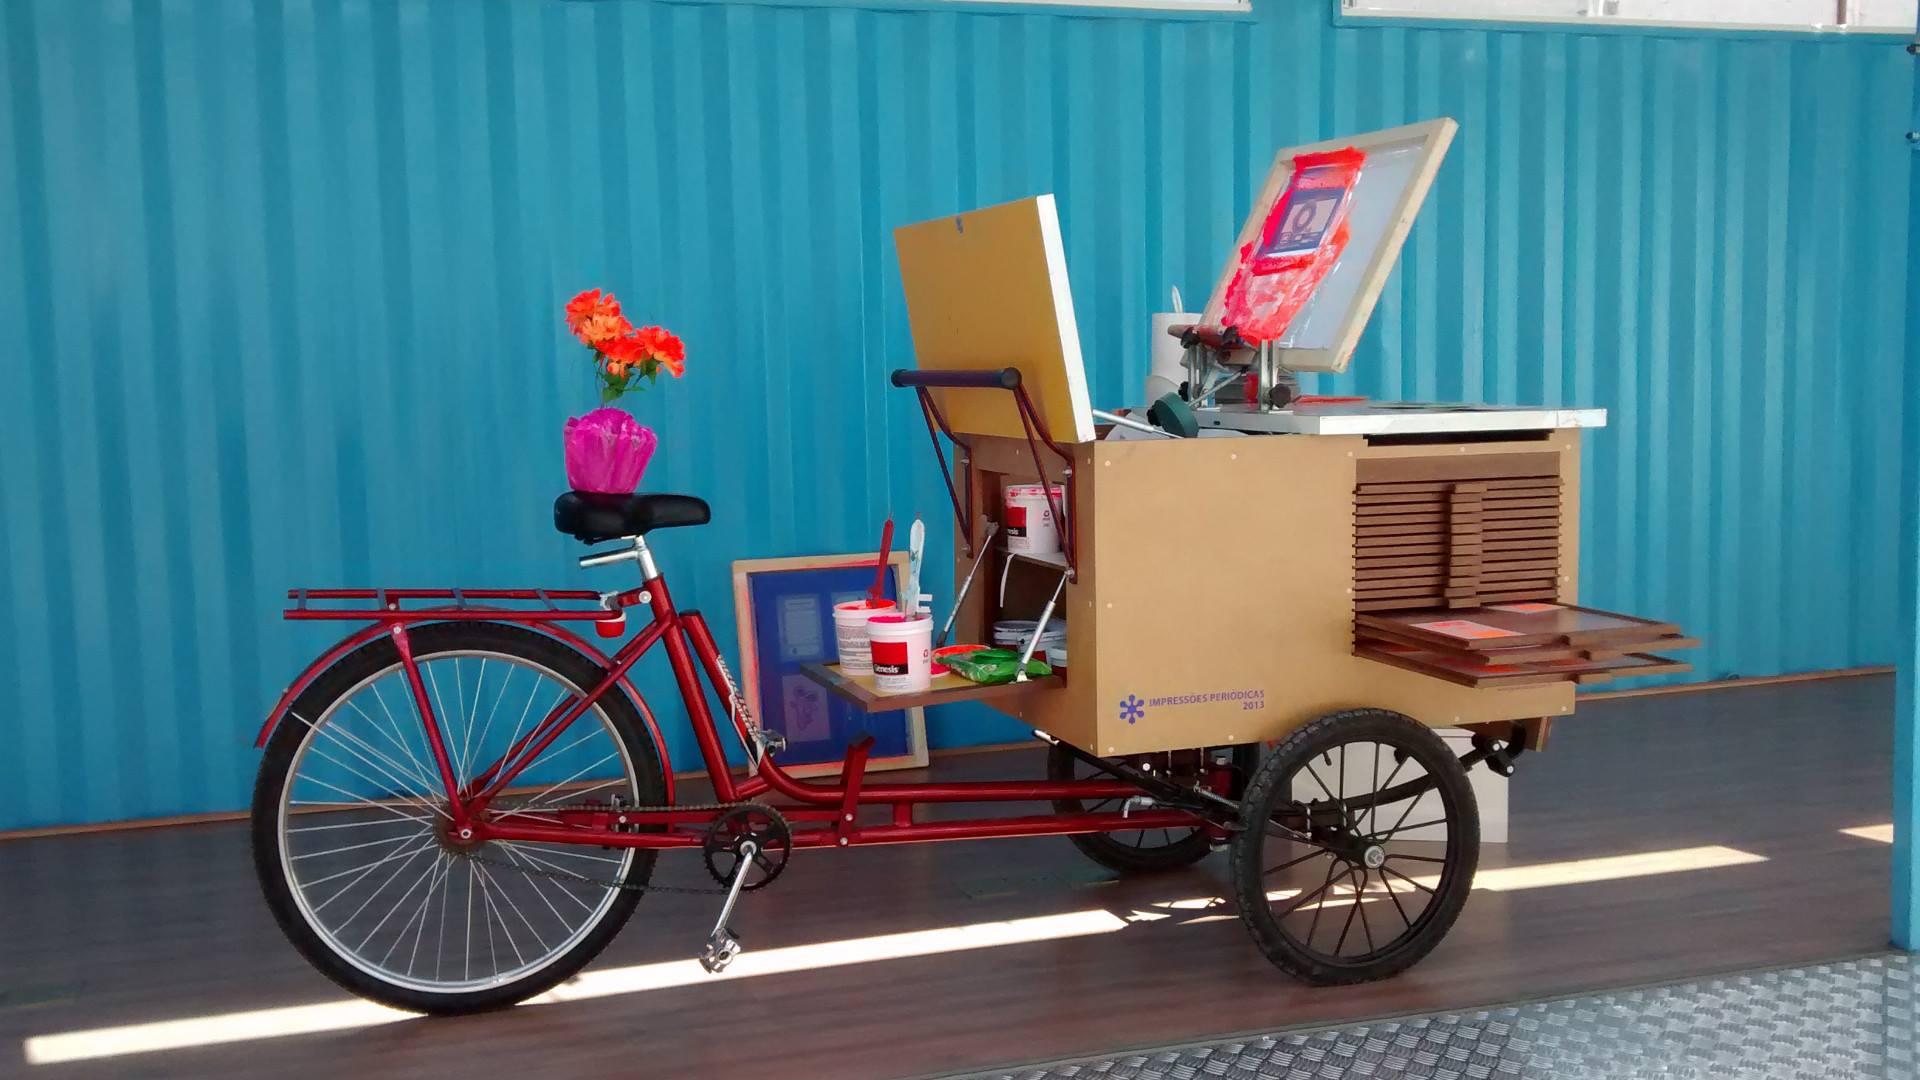 sericleta, bicicleta, serigrafia, IMS, IMS paulista